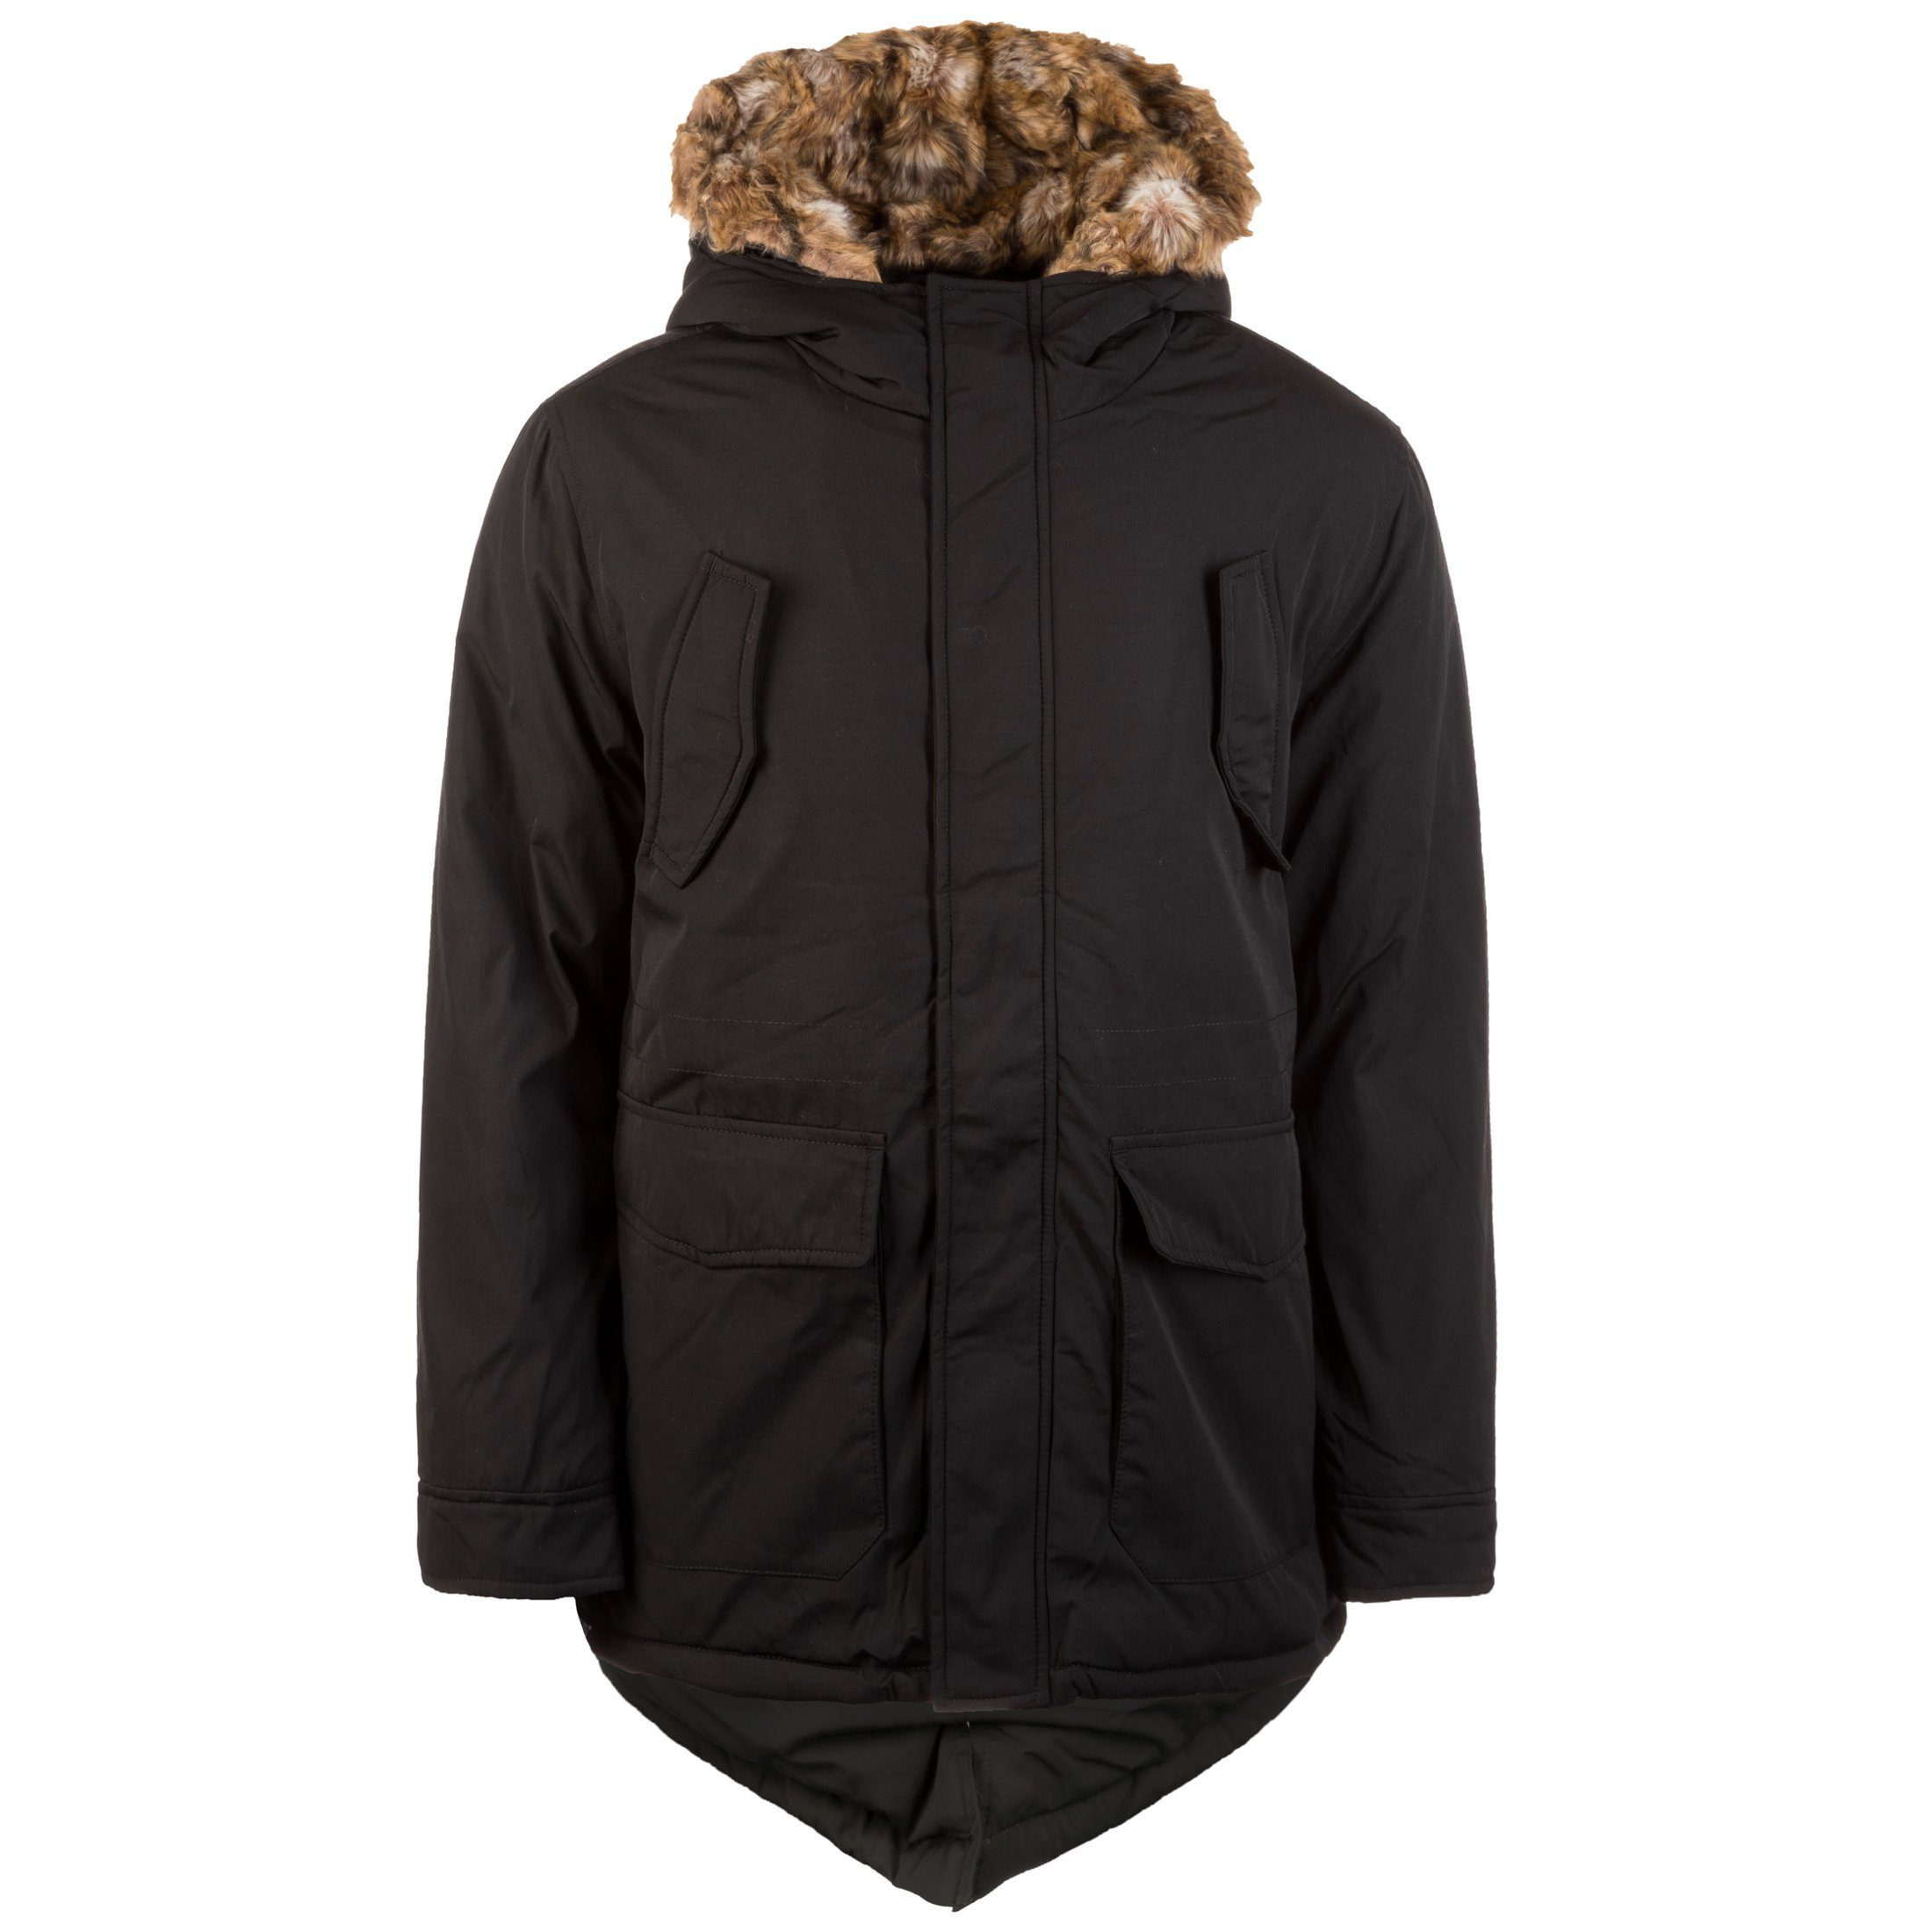 URBAN CLASSICS Winterjacke Hooded Faux Fur Herren | Bekleidung > Jacken > Winterjacken | Urban Classics